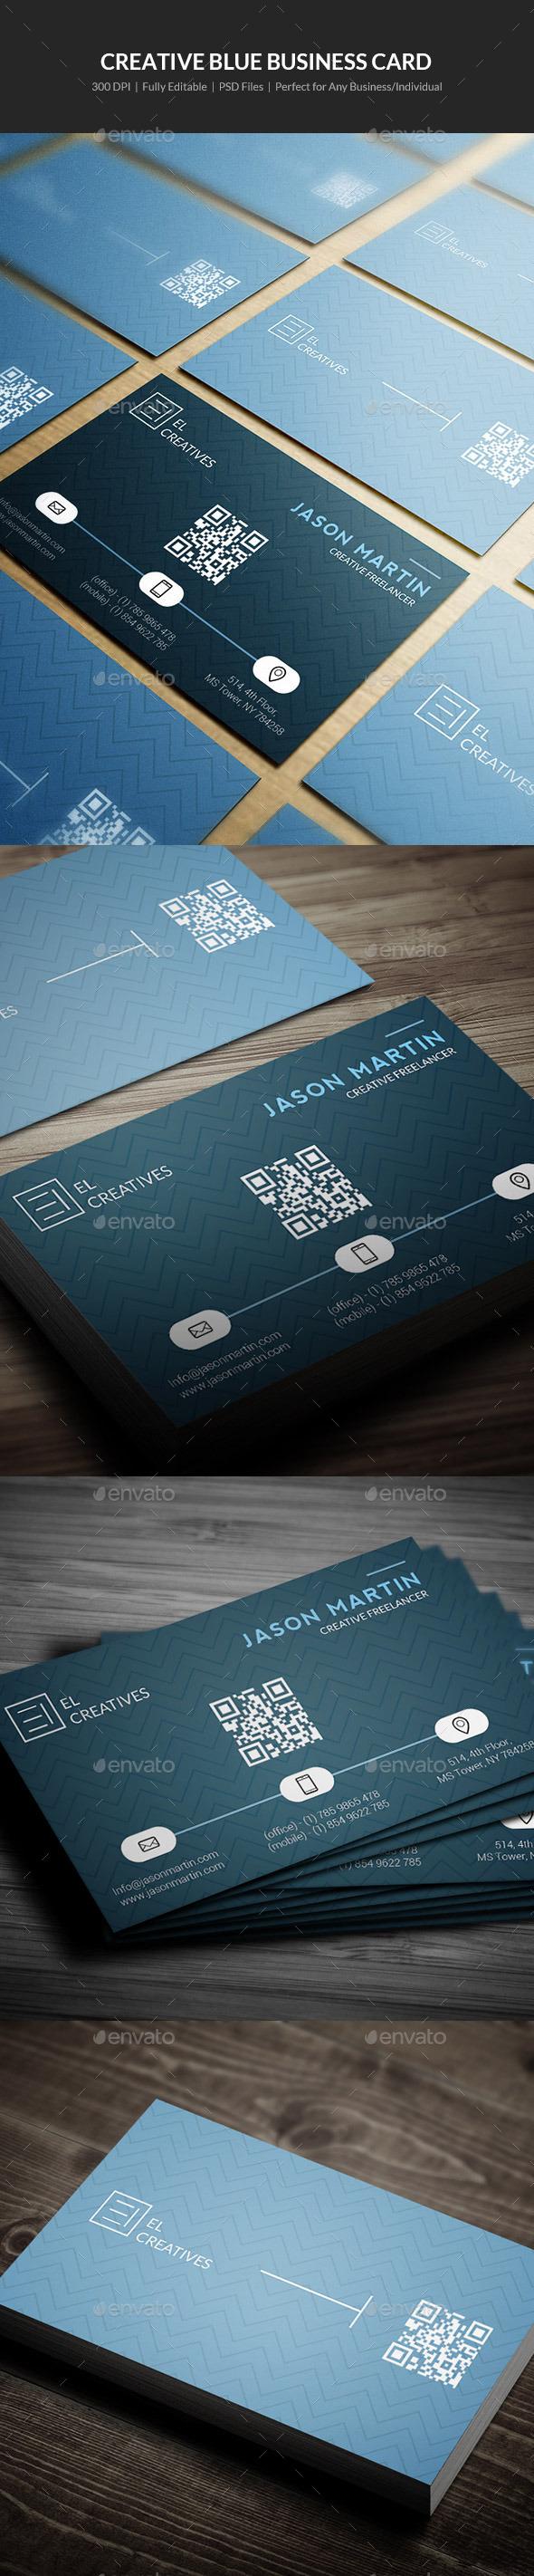 Creative Blue Business Card - 07 - Creative Business Cards